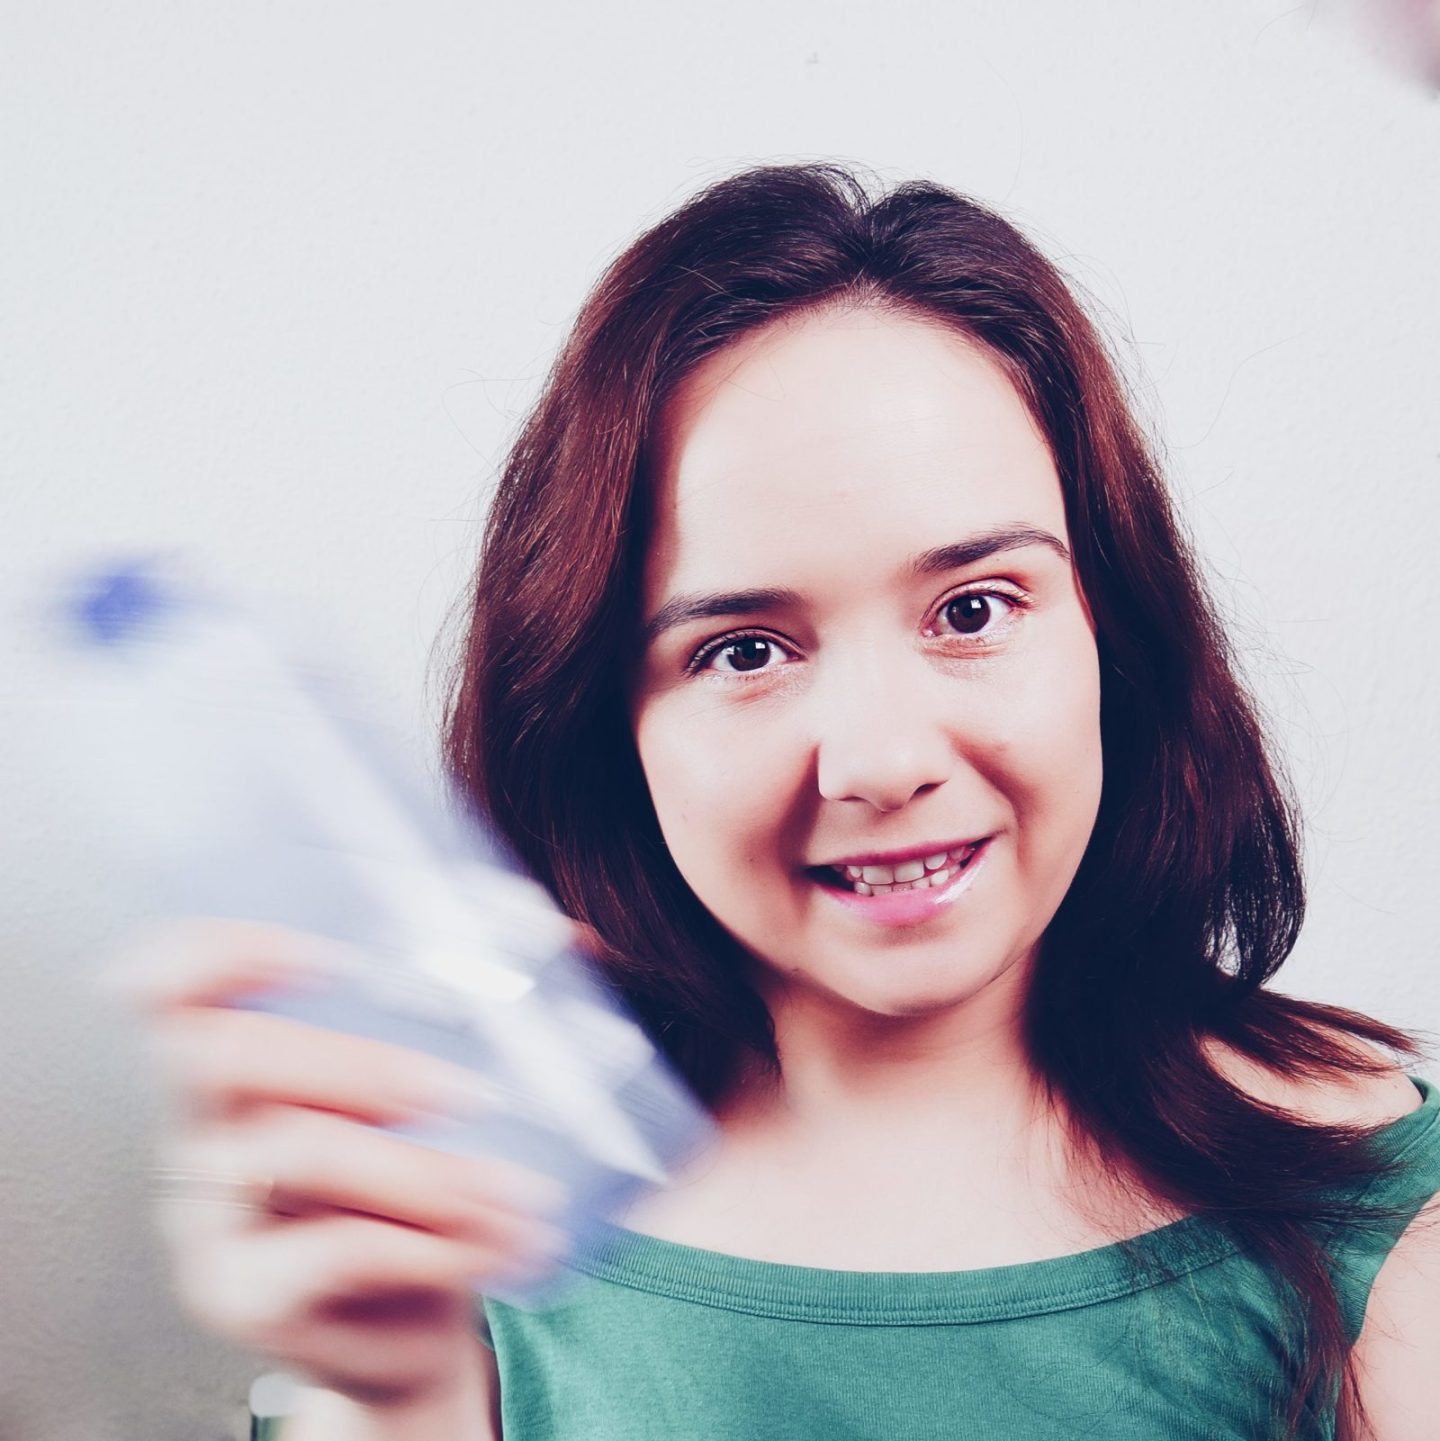 scoala de beauty vlogging proba photo deboratentis.ro